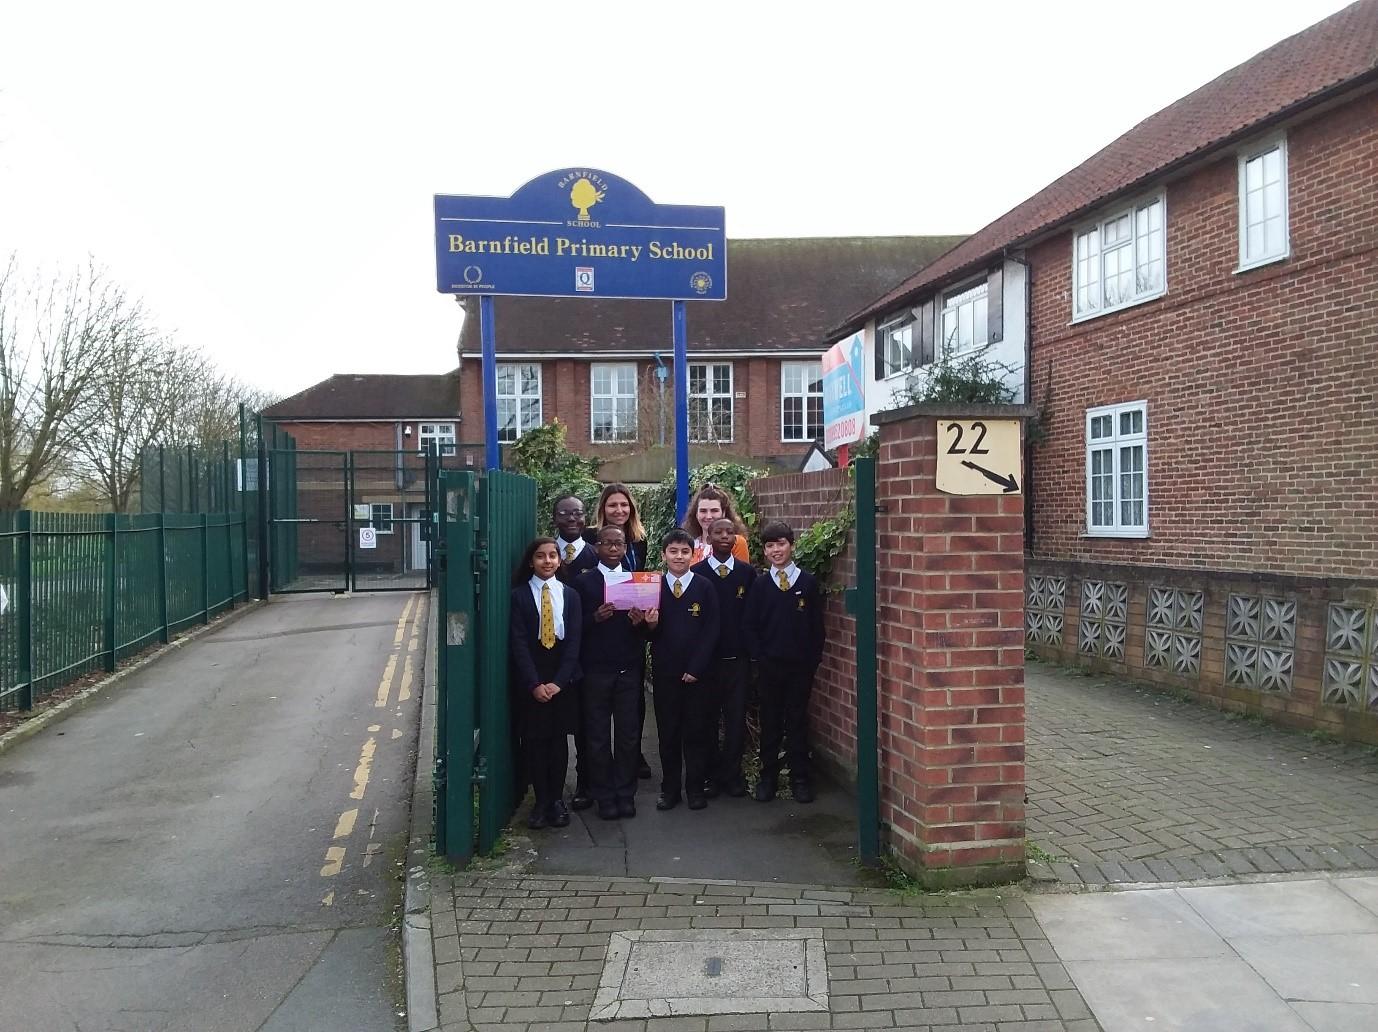 Barnfield Primary School Digital Leaders have big plans to ...